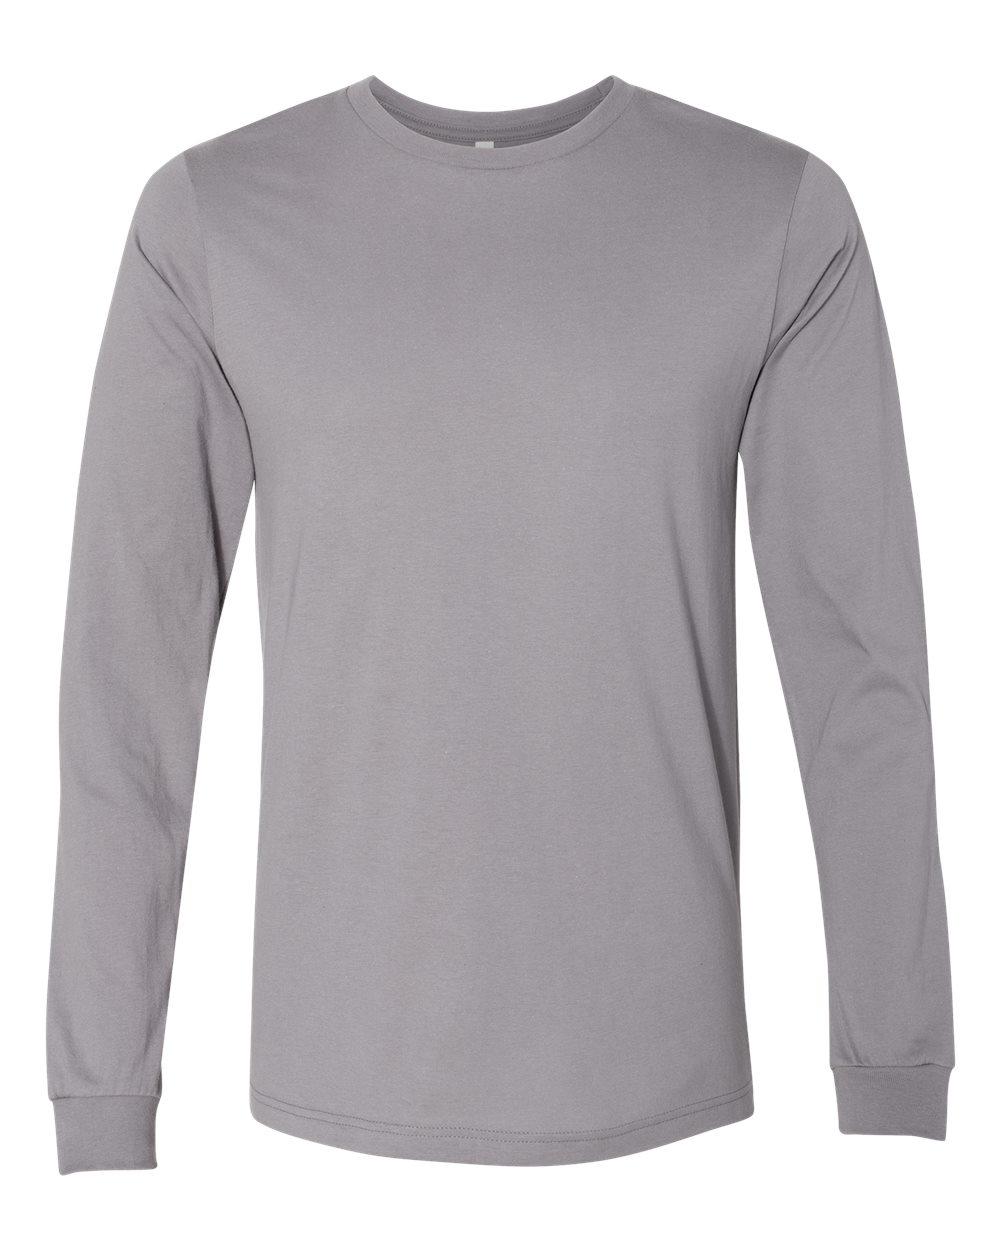 Bella-Canvas-Mens-Blank-Top-Long-Sleeve-Jersey-Tee-T-Shirt-3501-up-to-3XL thumbnail 107